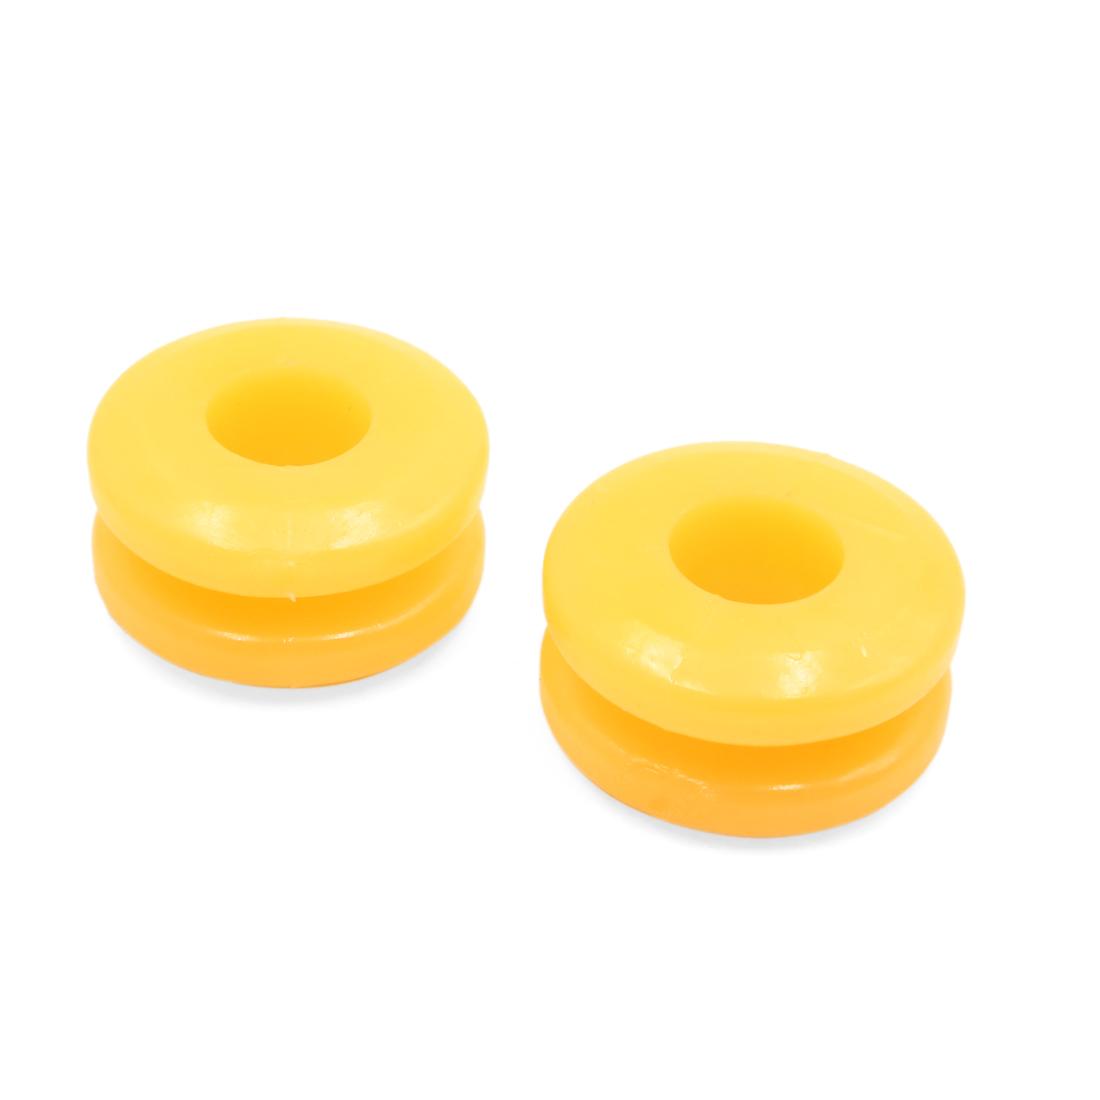 2Pcs 52 x 21 x 16mm Orange Rubber Shock Absorber Bushings Damper for Auto Car